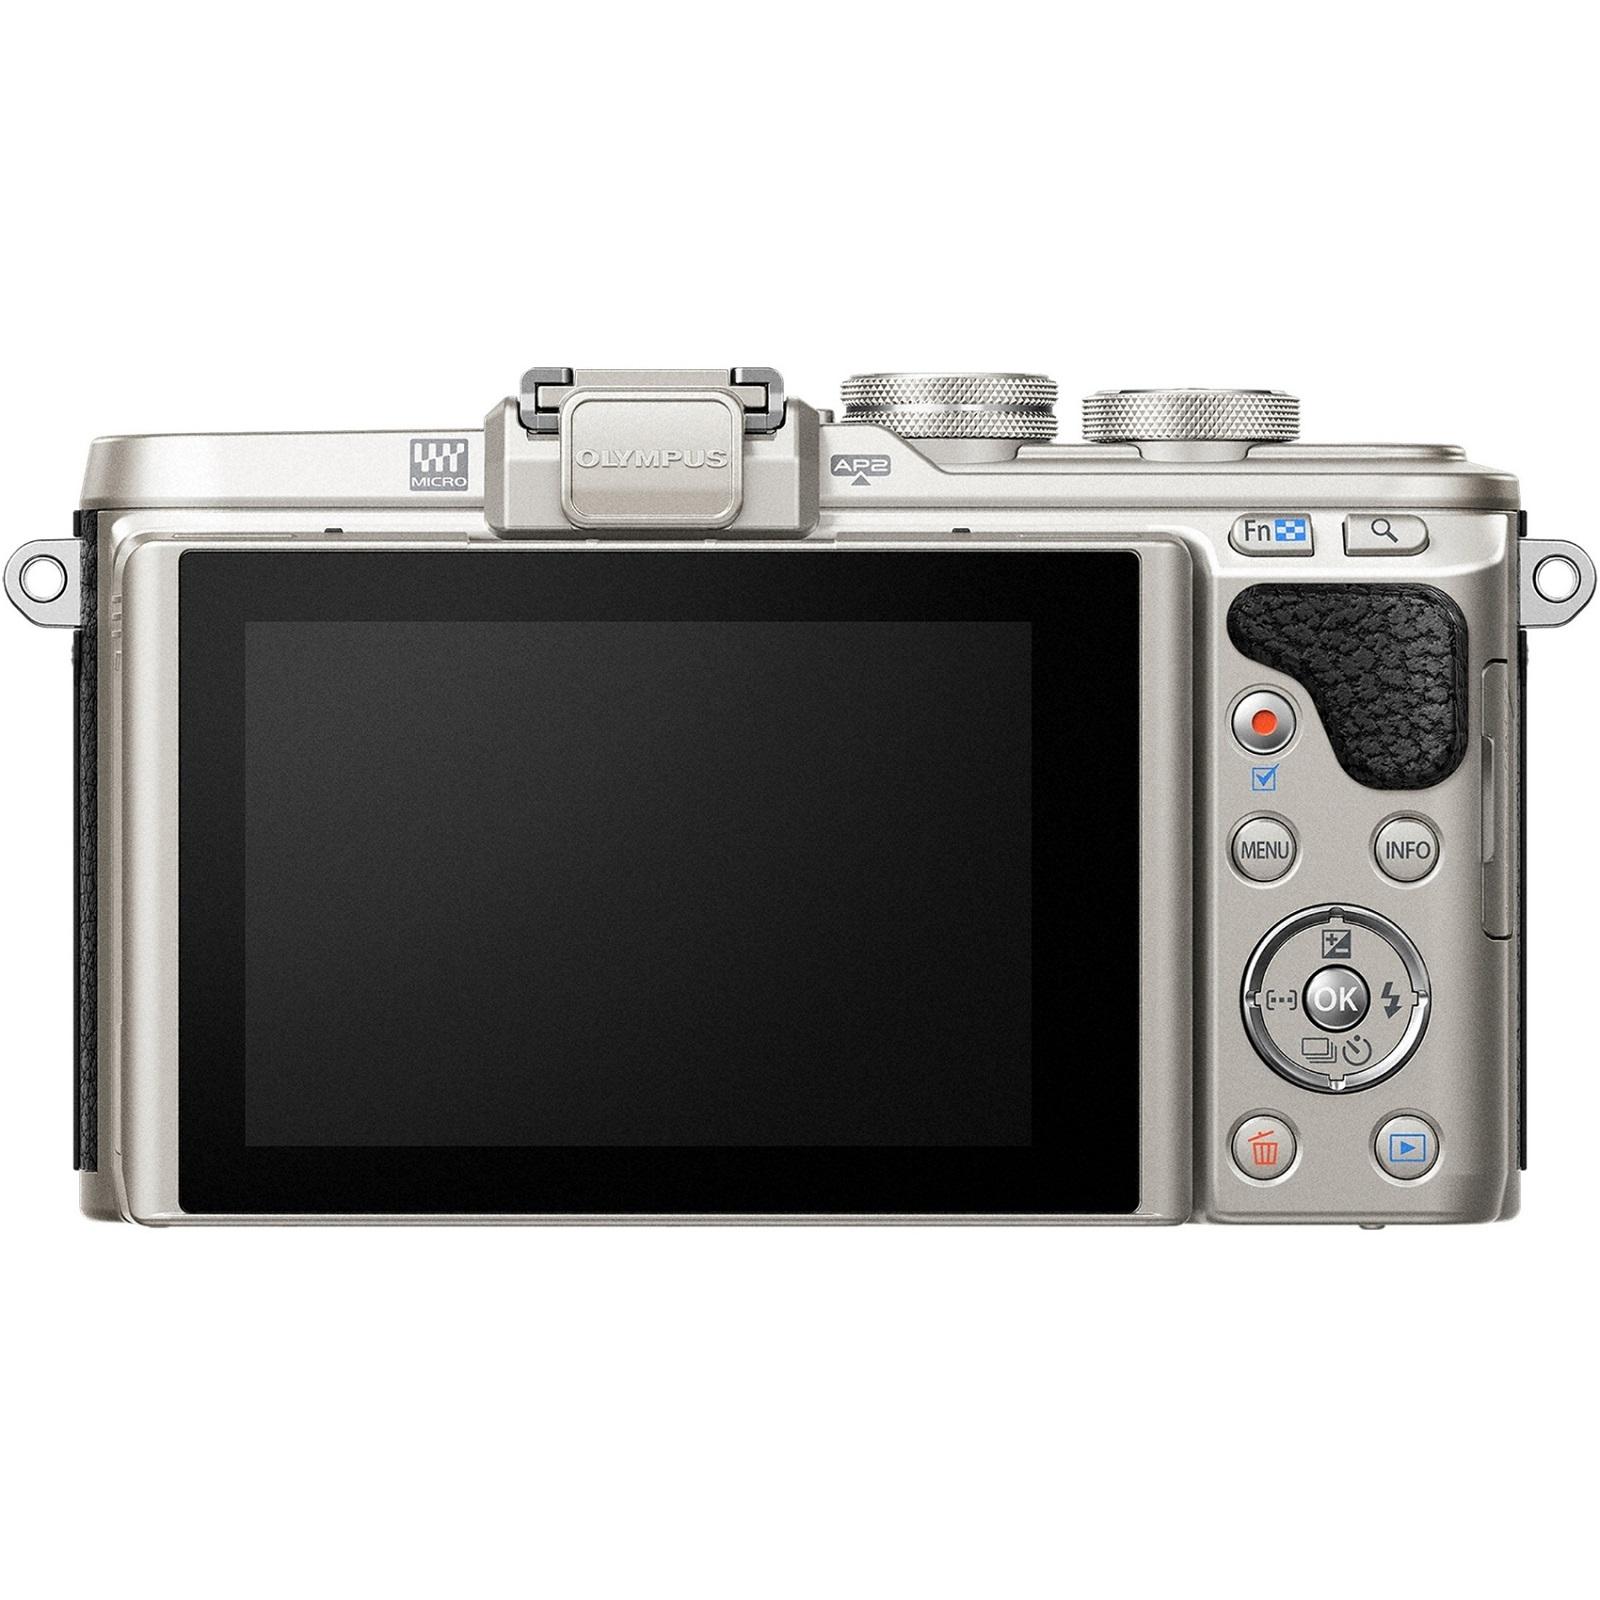 OLYMPUS オリンパス ミラーレス一眼カメラ PEN E-PL8 ボディ ブラック 新品